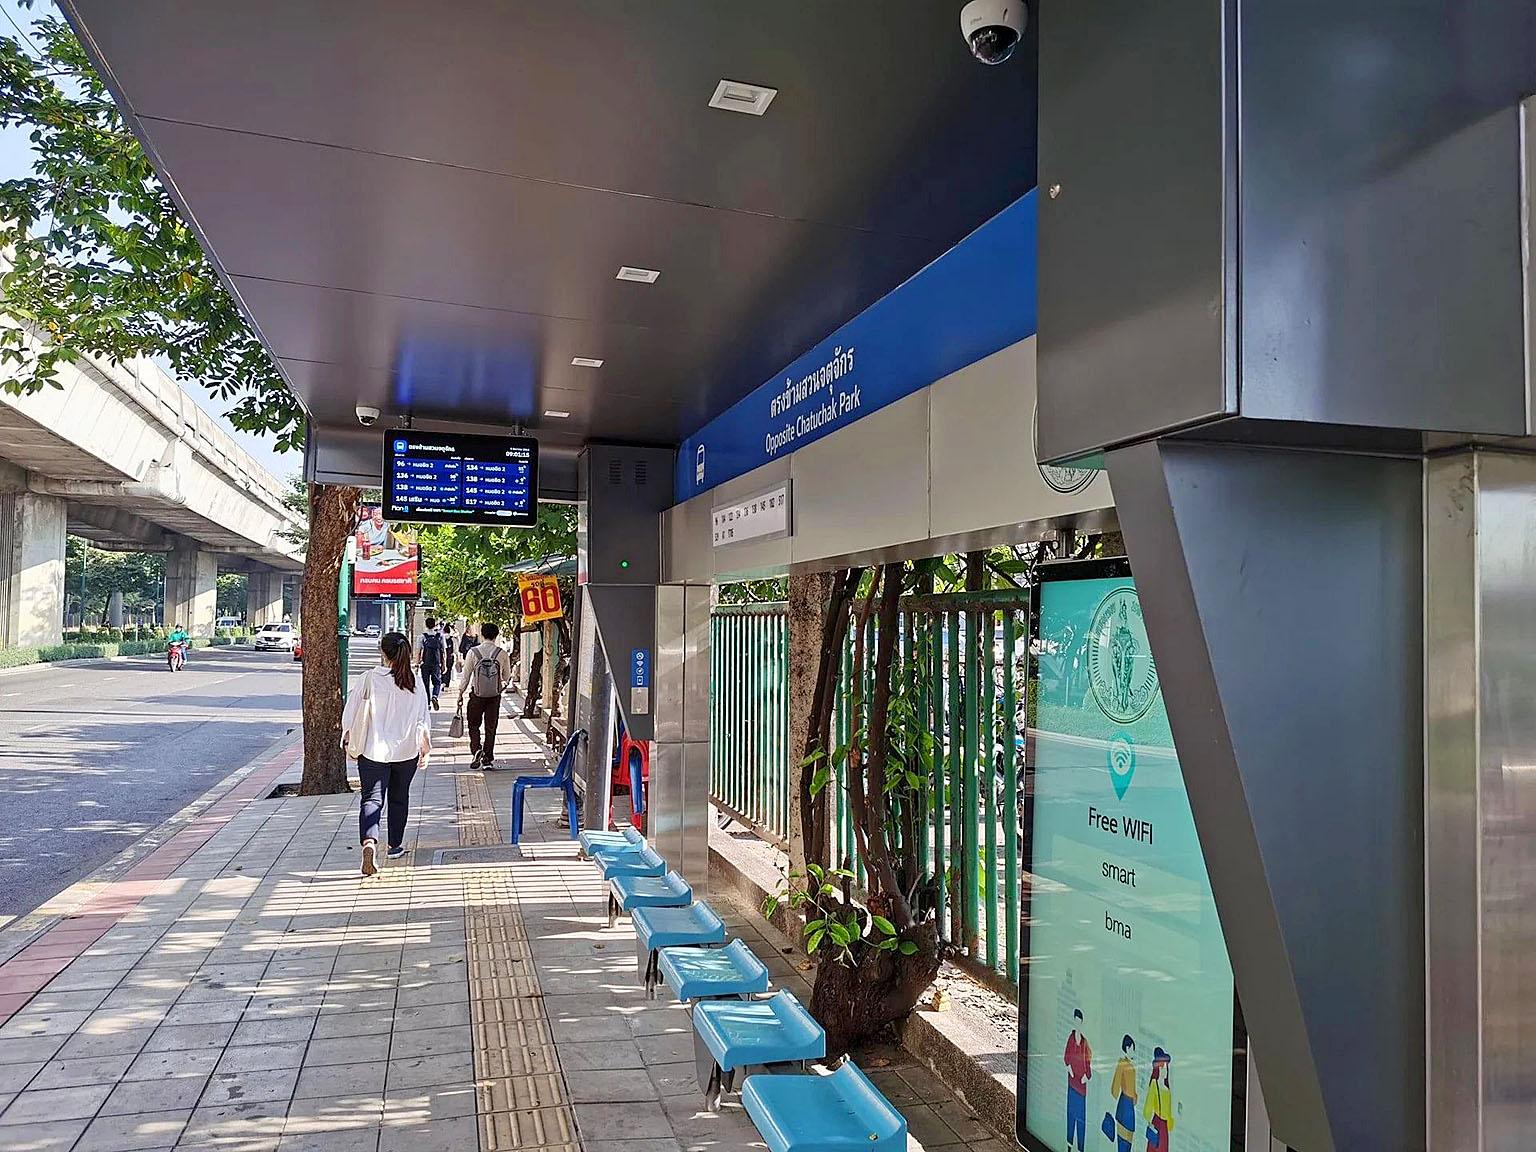 Bangkok New Bus Stop 01.jpg